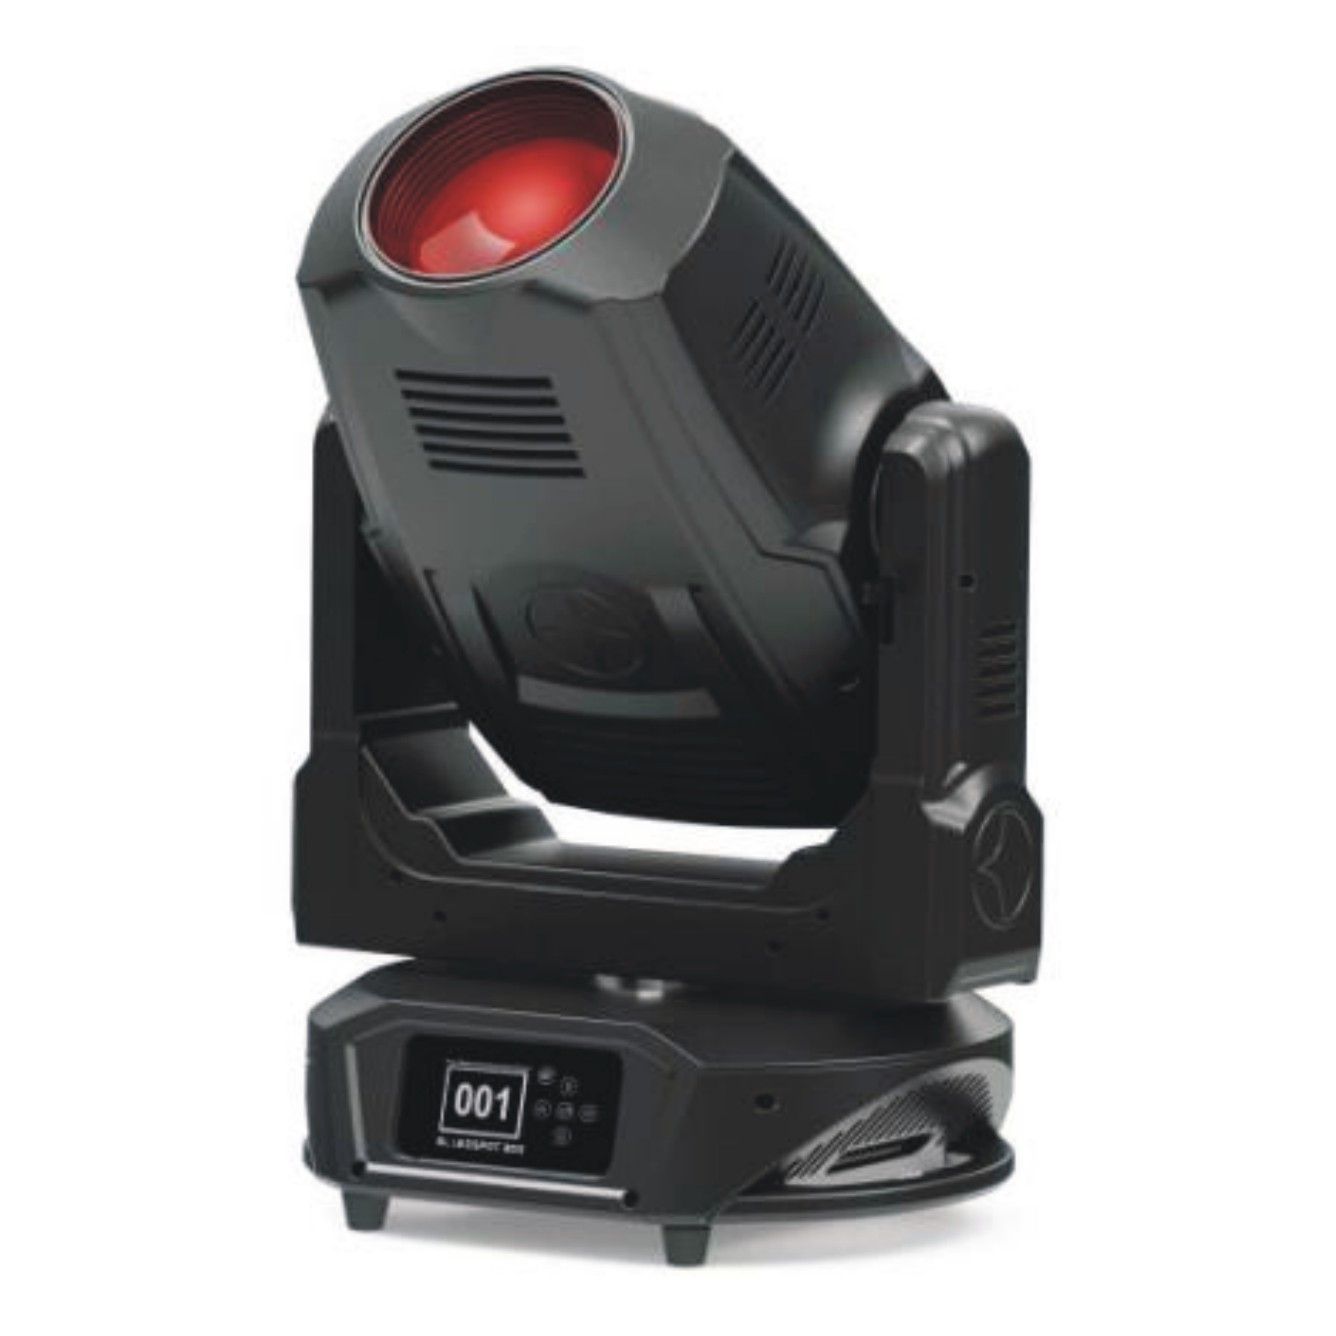 SL LEDSPOT 300 电脑摇头图案灯